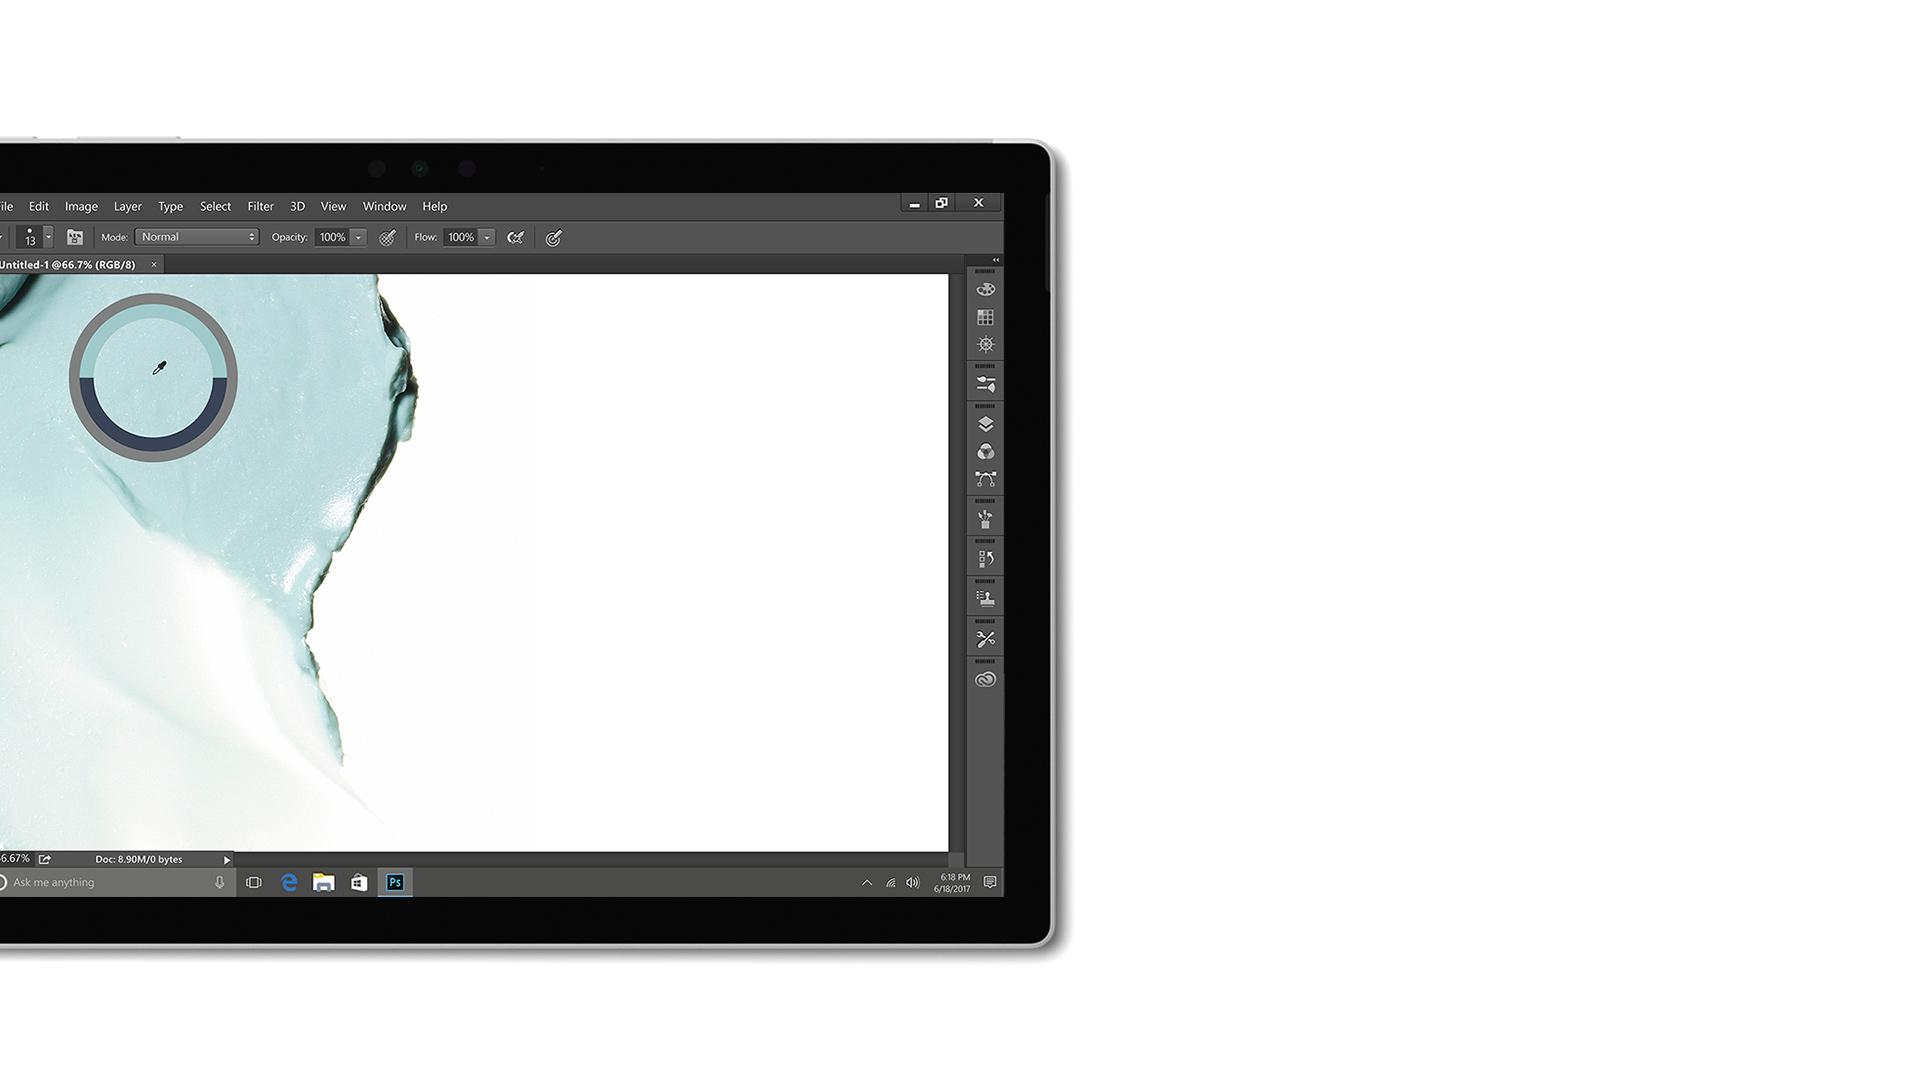 Surface 上的 Creative Cloud 應用程式螢幕擷取畫面。